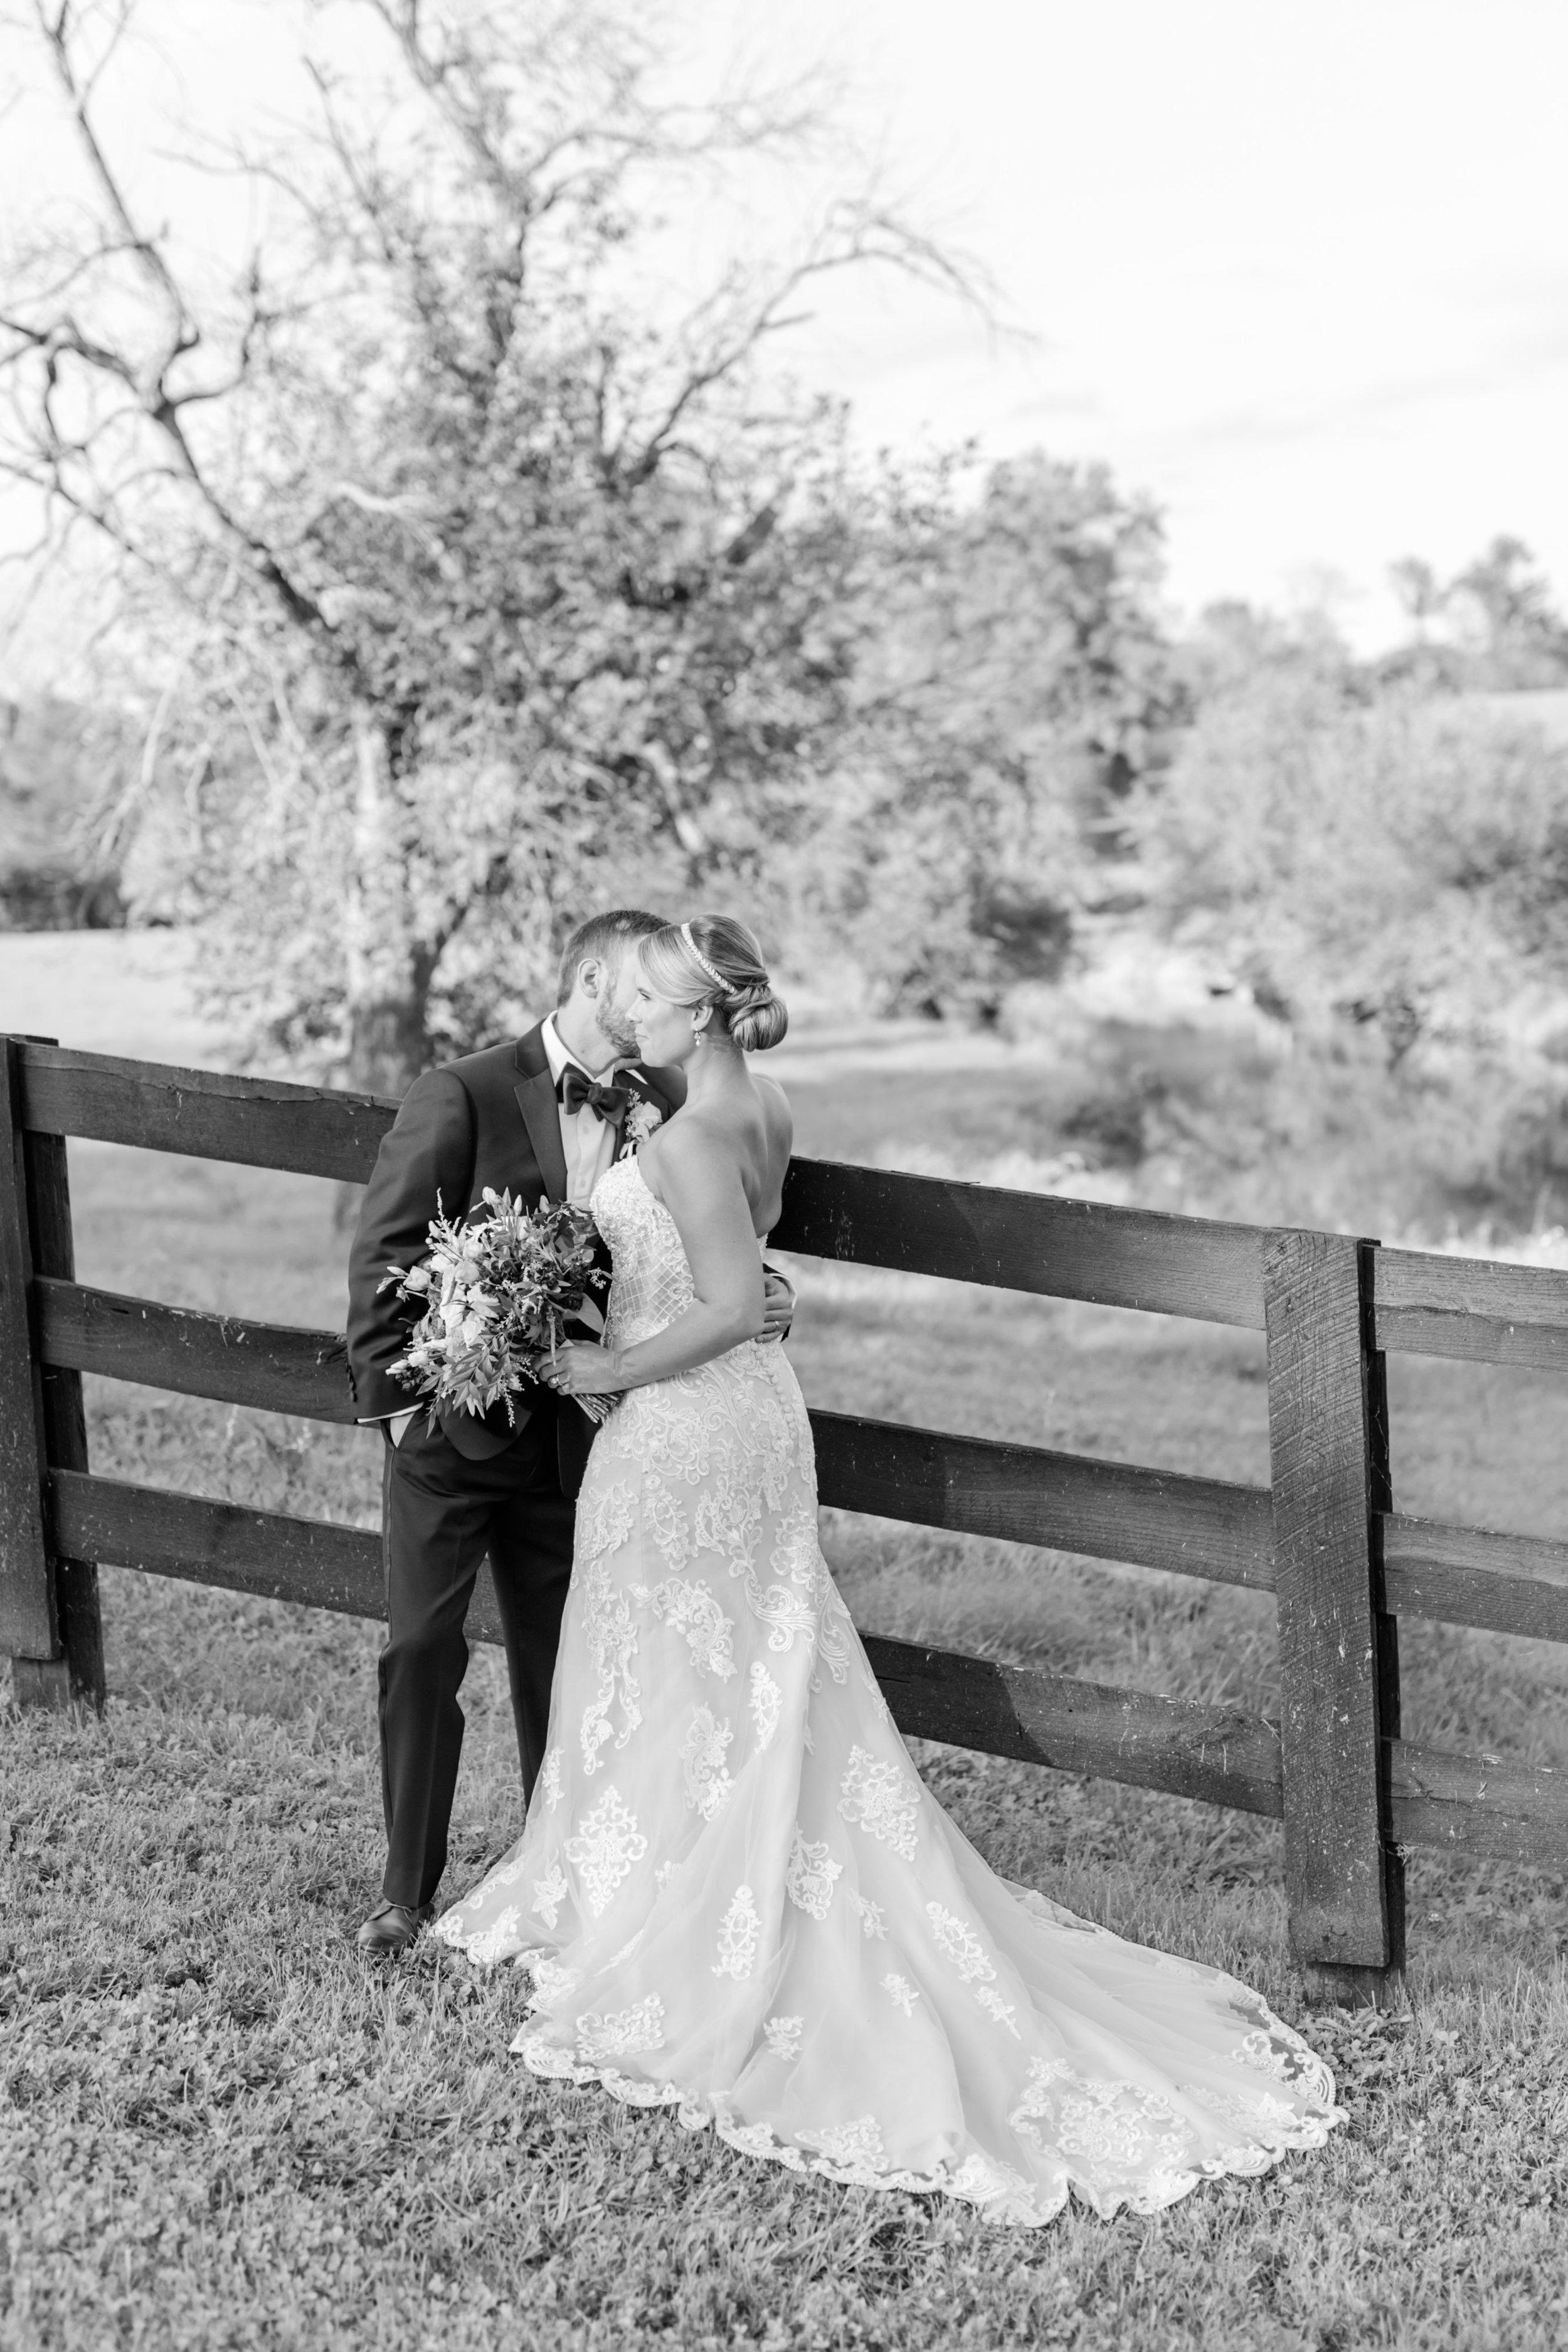 093018 VA Samantha Sihelnick + Russell - Megan Kelsey Photography LWi EP-0008.jpg